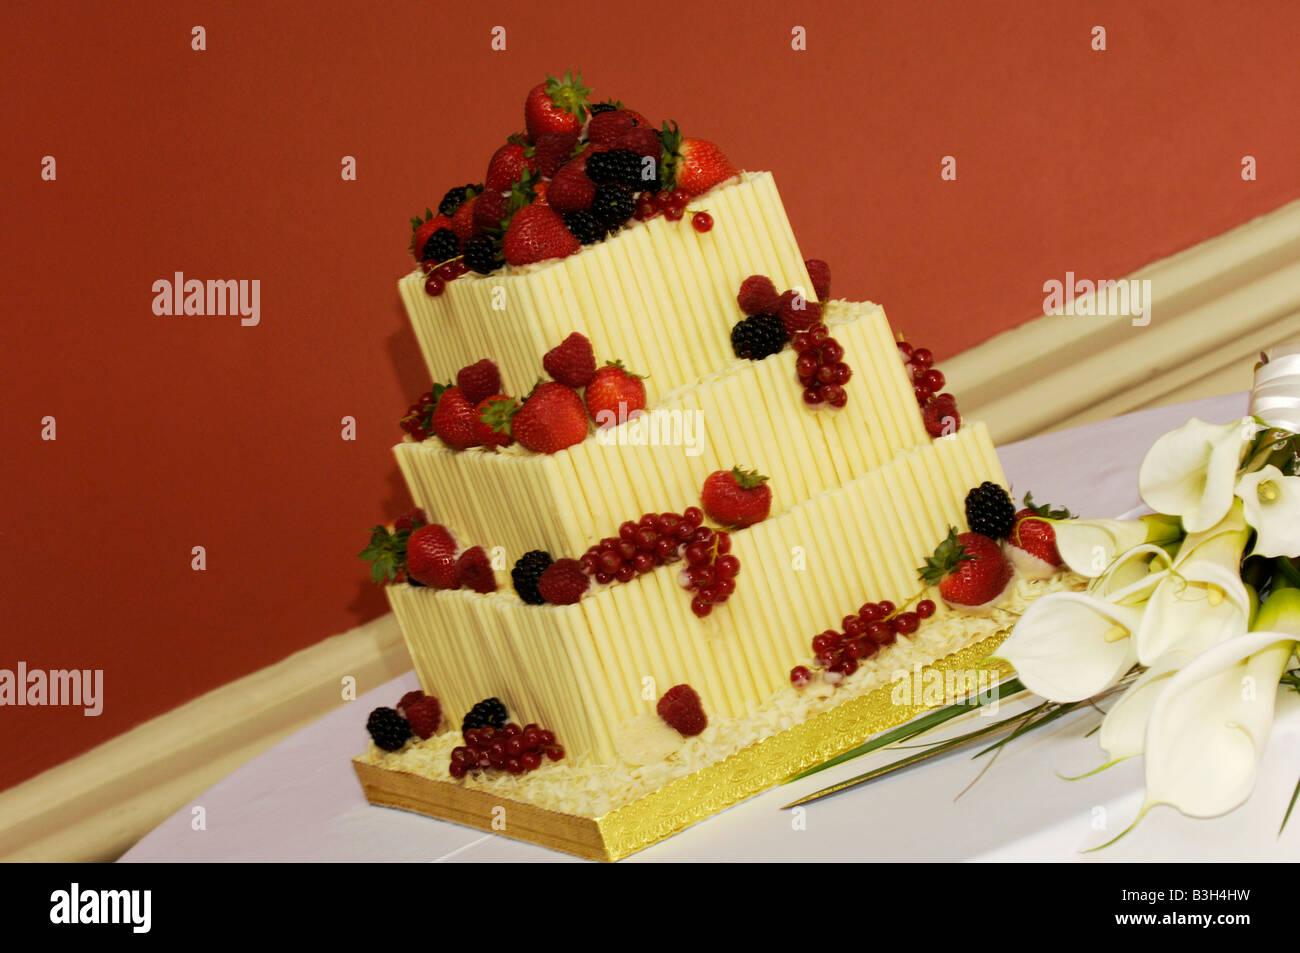 Unique Wedding Cake Stock Photos & Unique Wedding Cake Stock Images ...